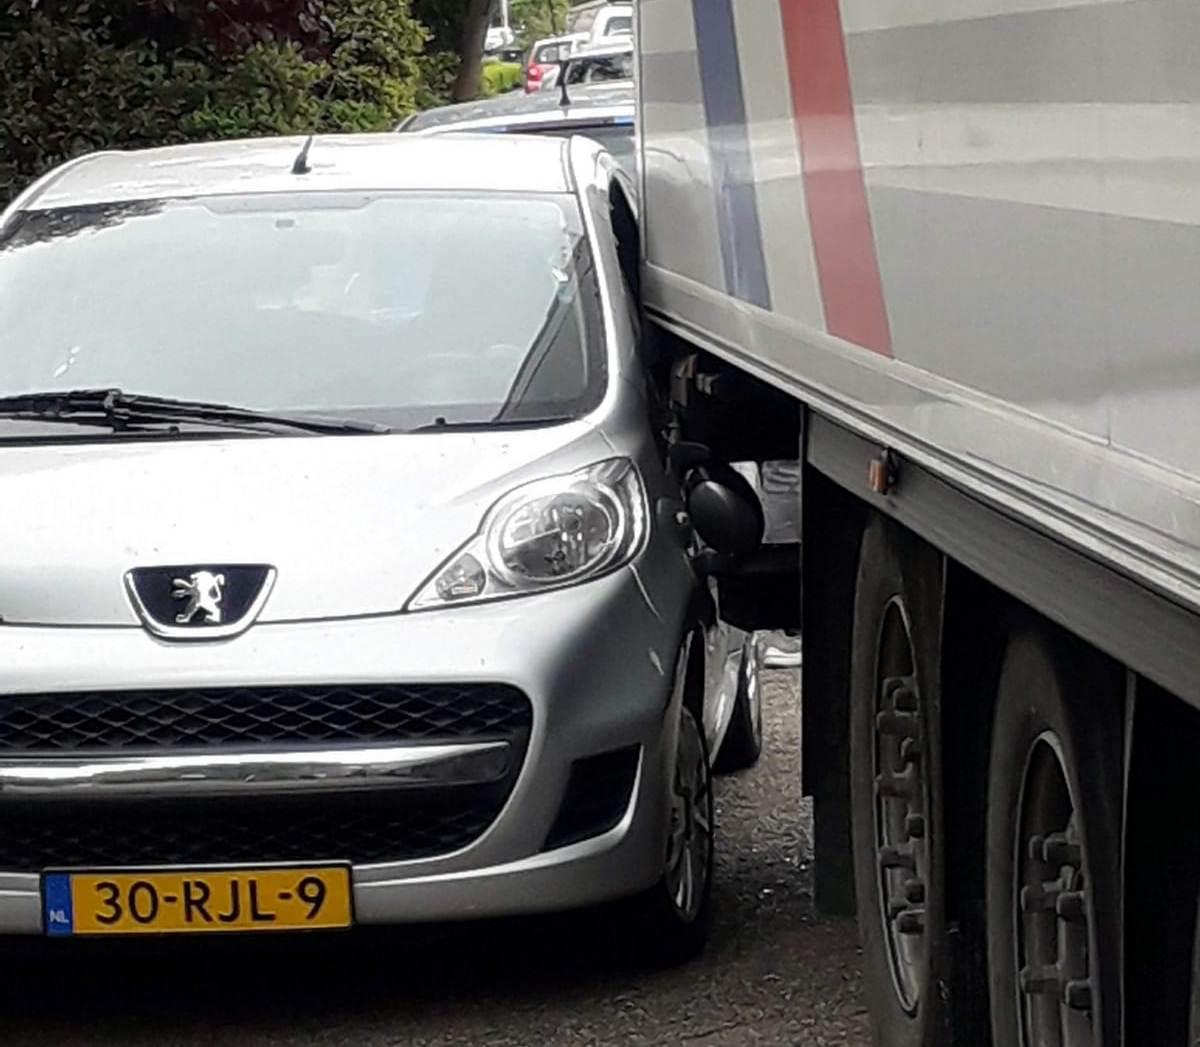 Poolse vrachtwagenchauffeur rijdt zich klem